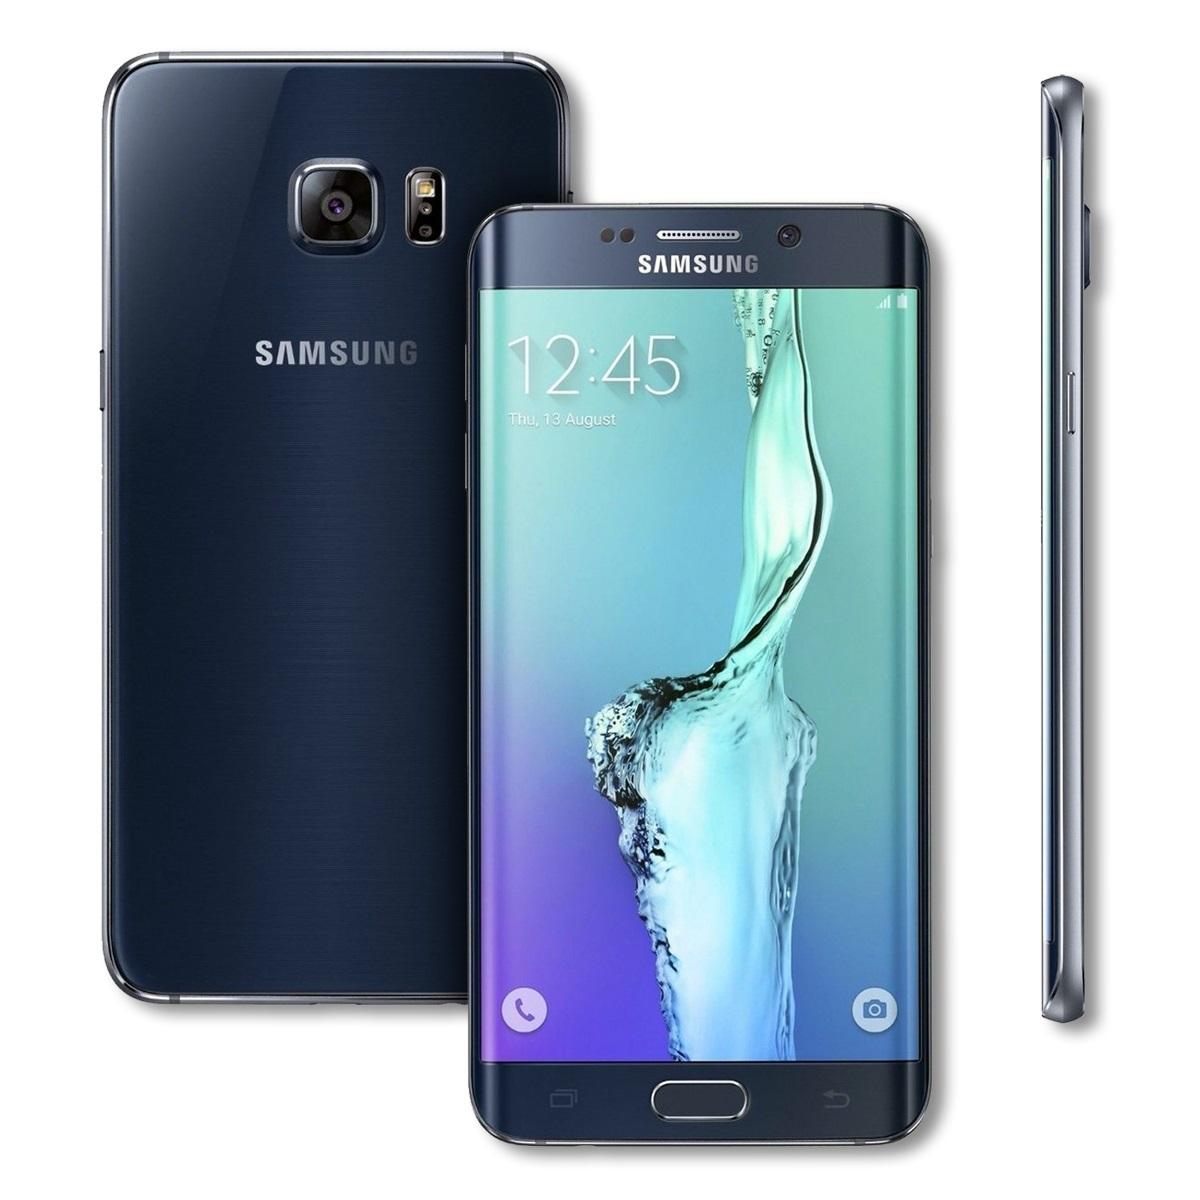 samsung galaxy s6 edge plus sm g928v smartphone verizon 4g lte 32gb ebay. Black Bedroom Furniture Sets. Home Design Ideas